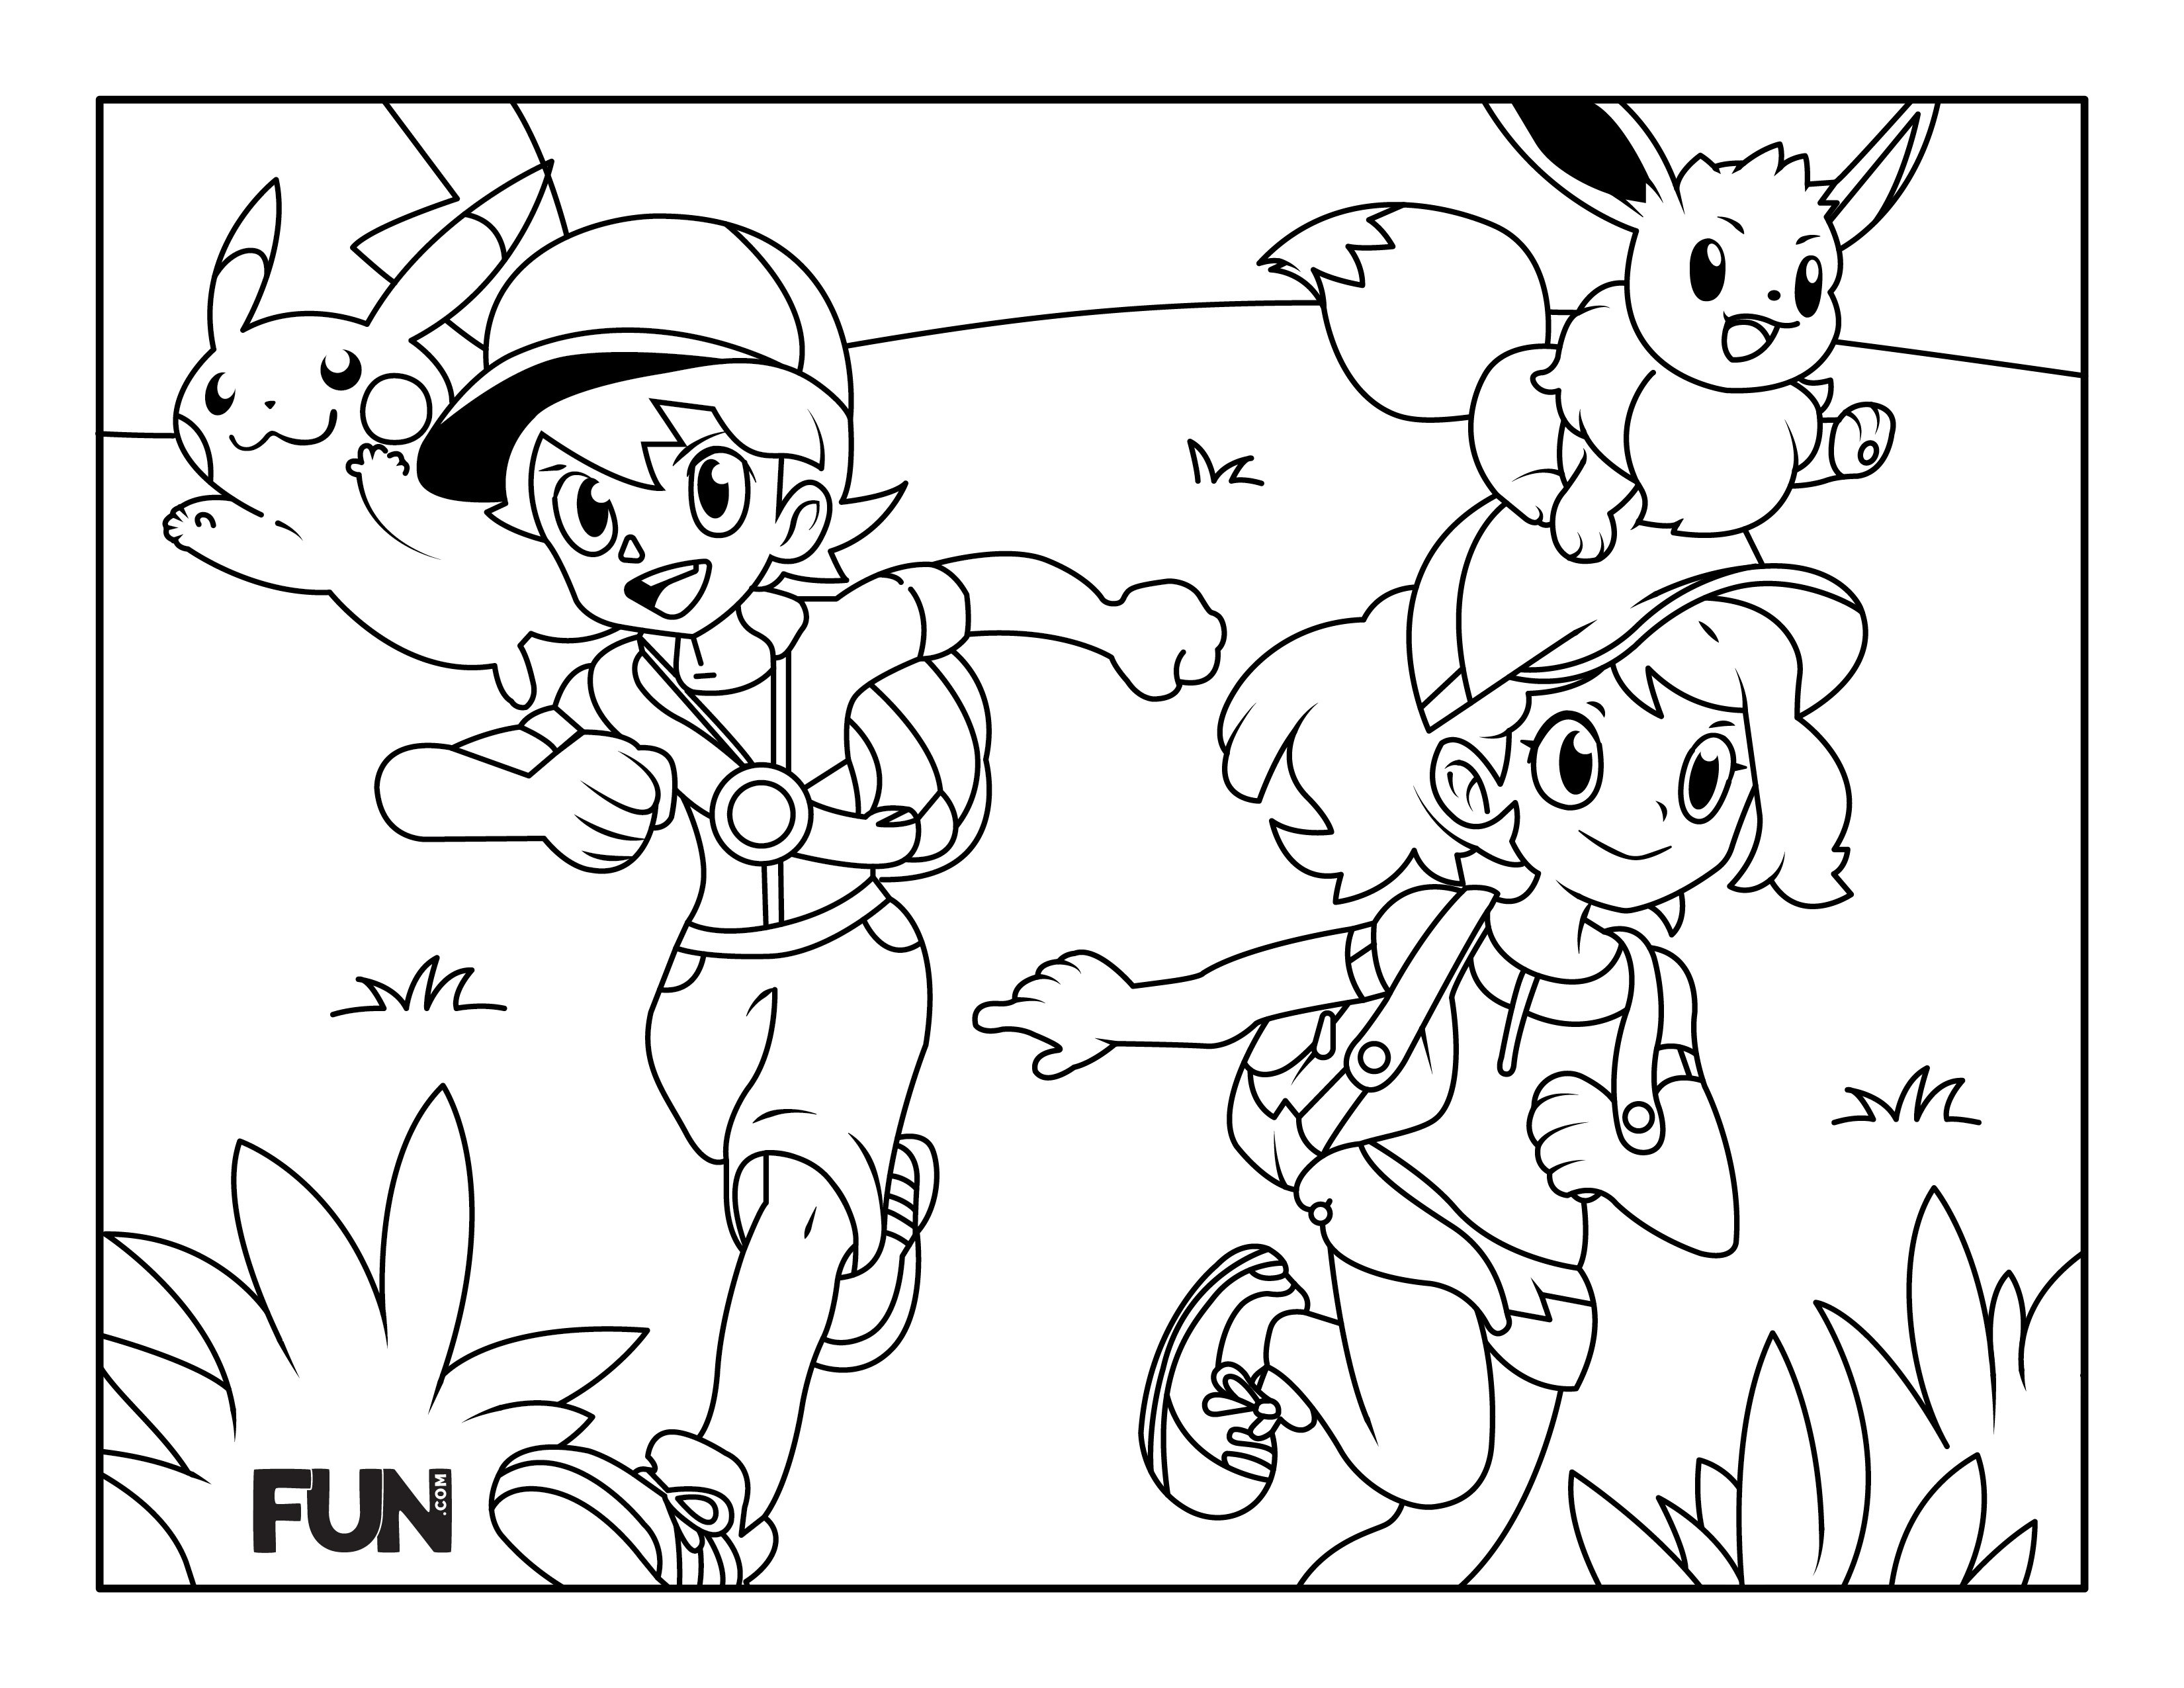 Pokémoncoloring page